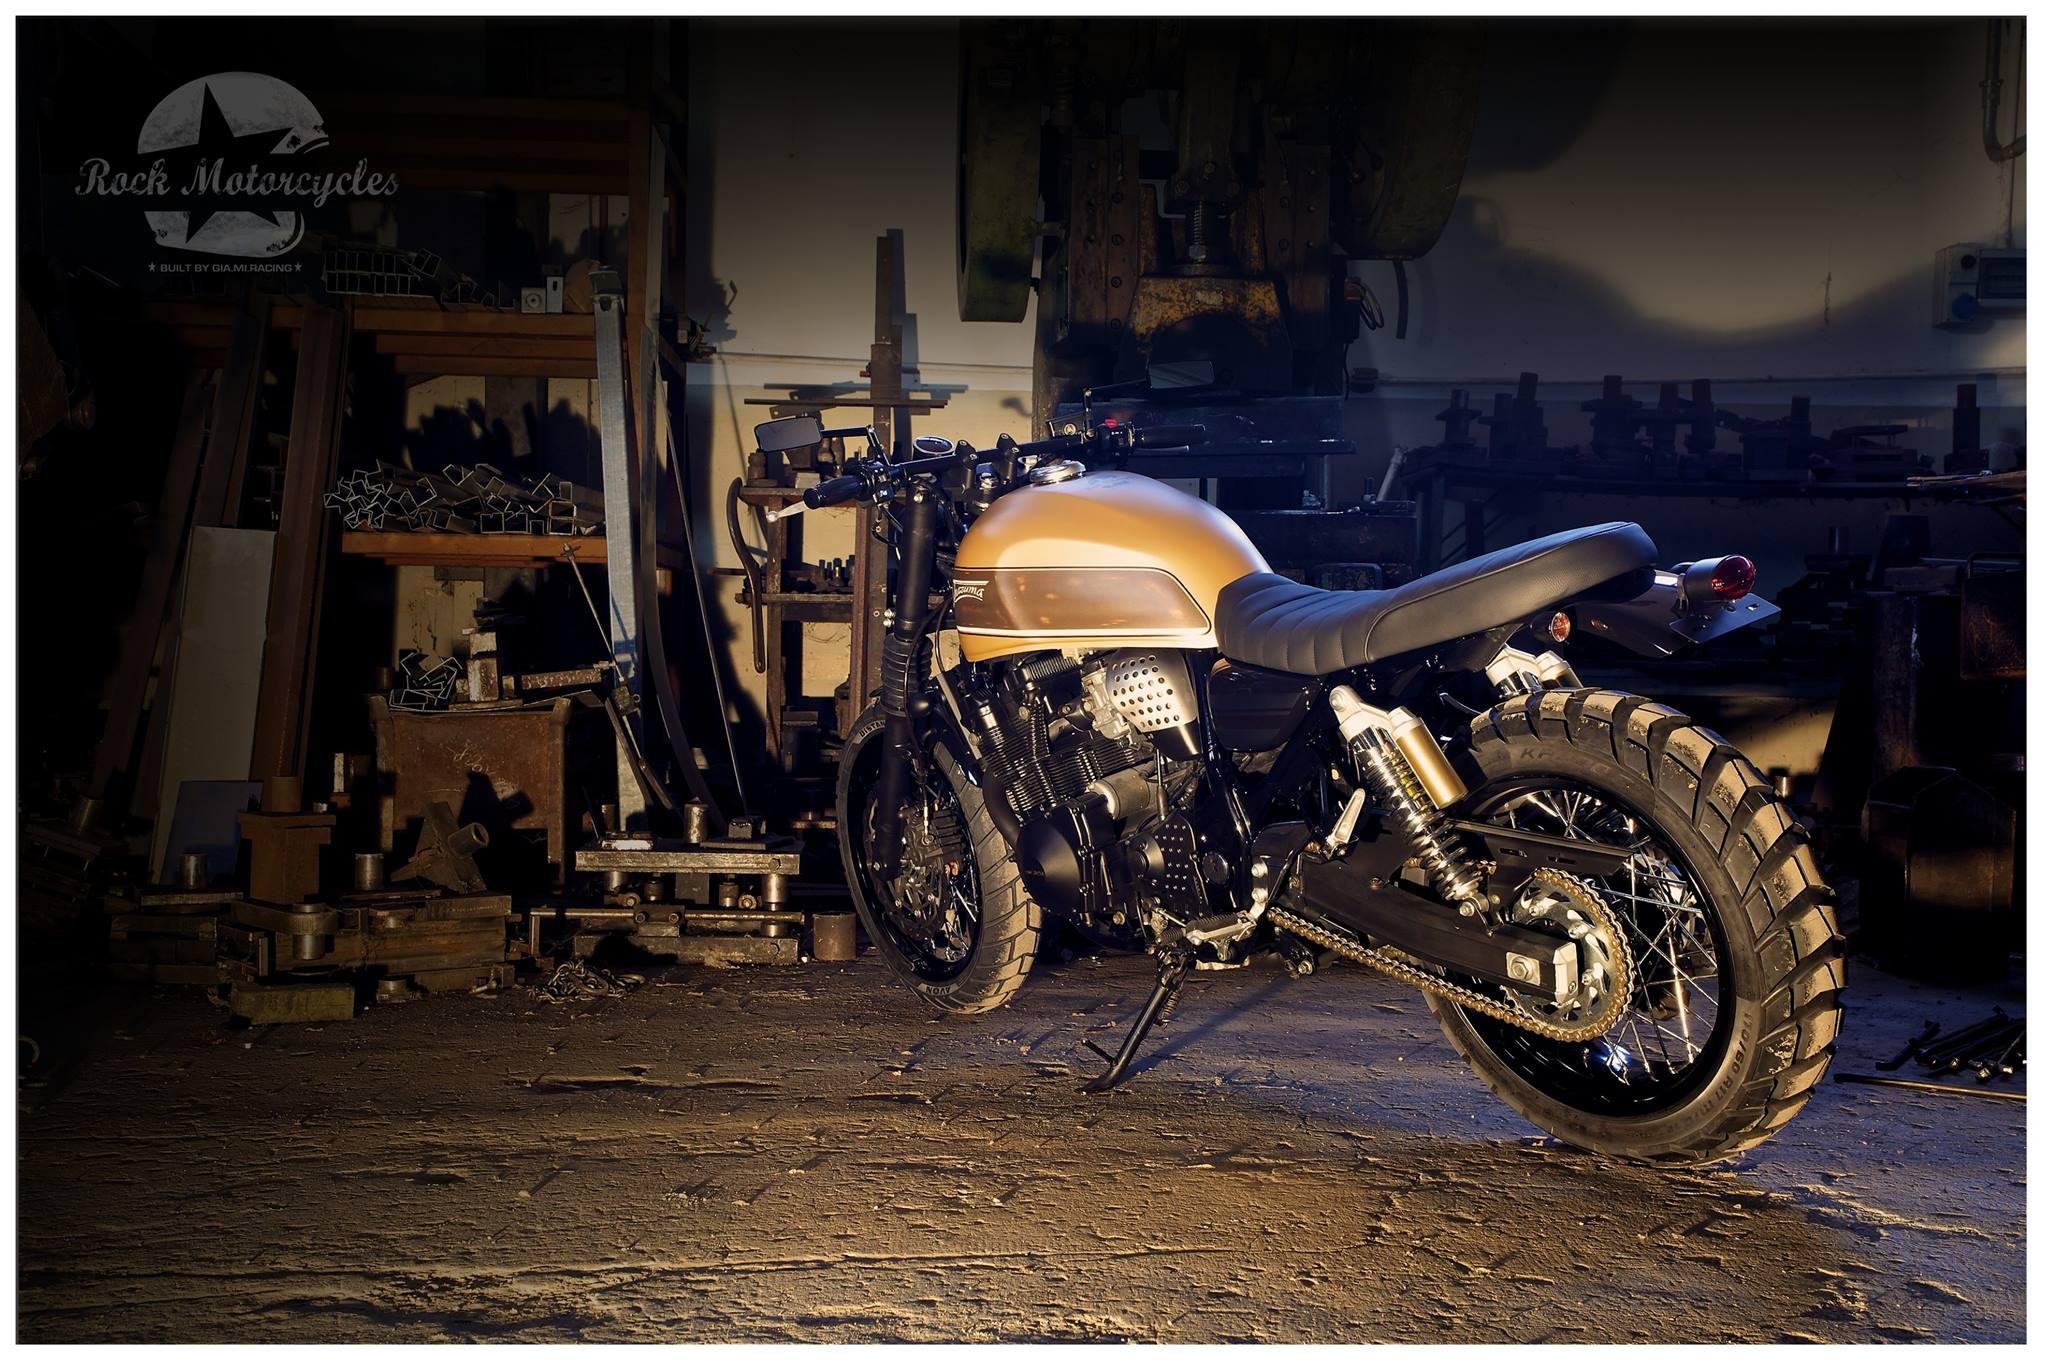 Suzuki Inazuma Scrambler By Rock Motorcycles Photo Gallery on Sportster Paint